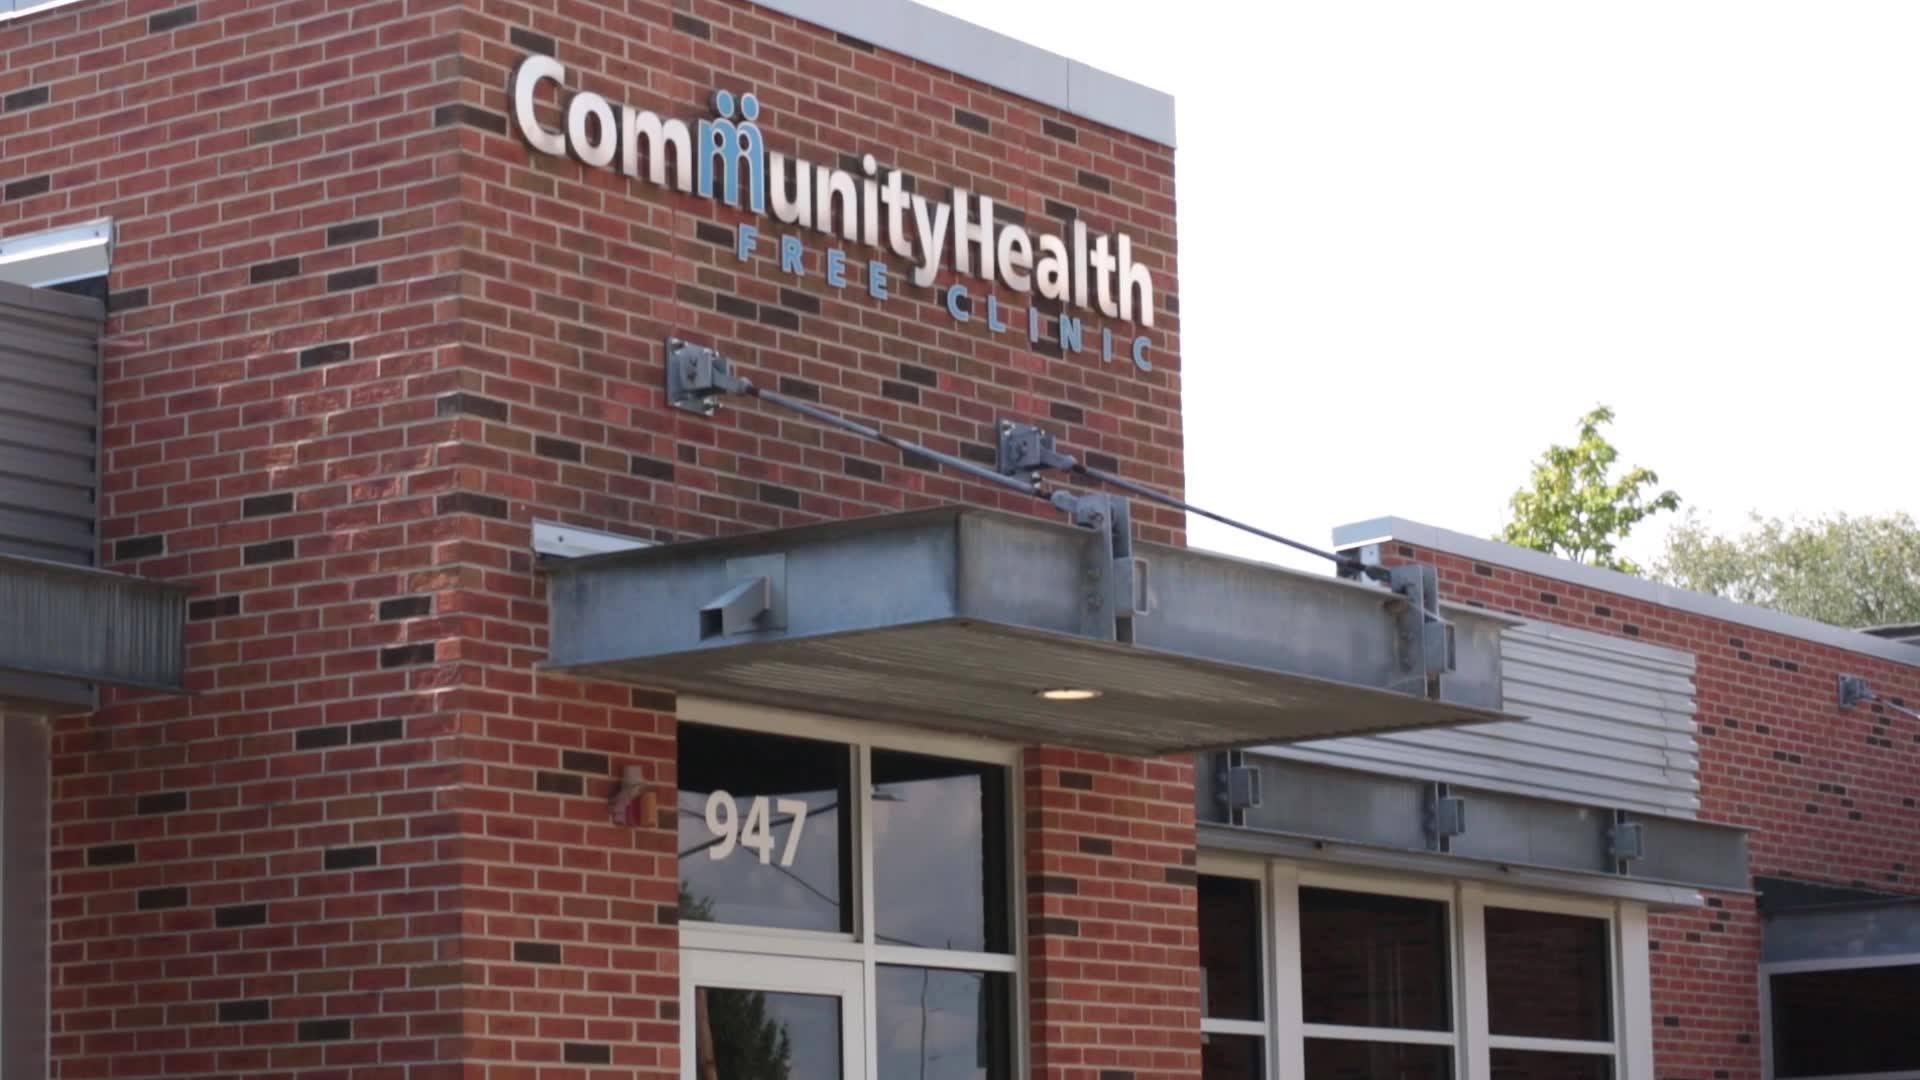 Community Health Free Clinic